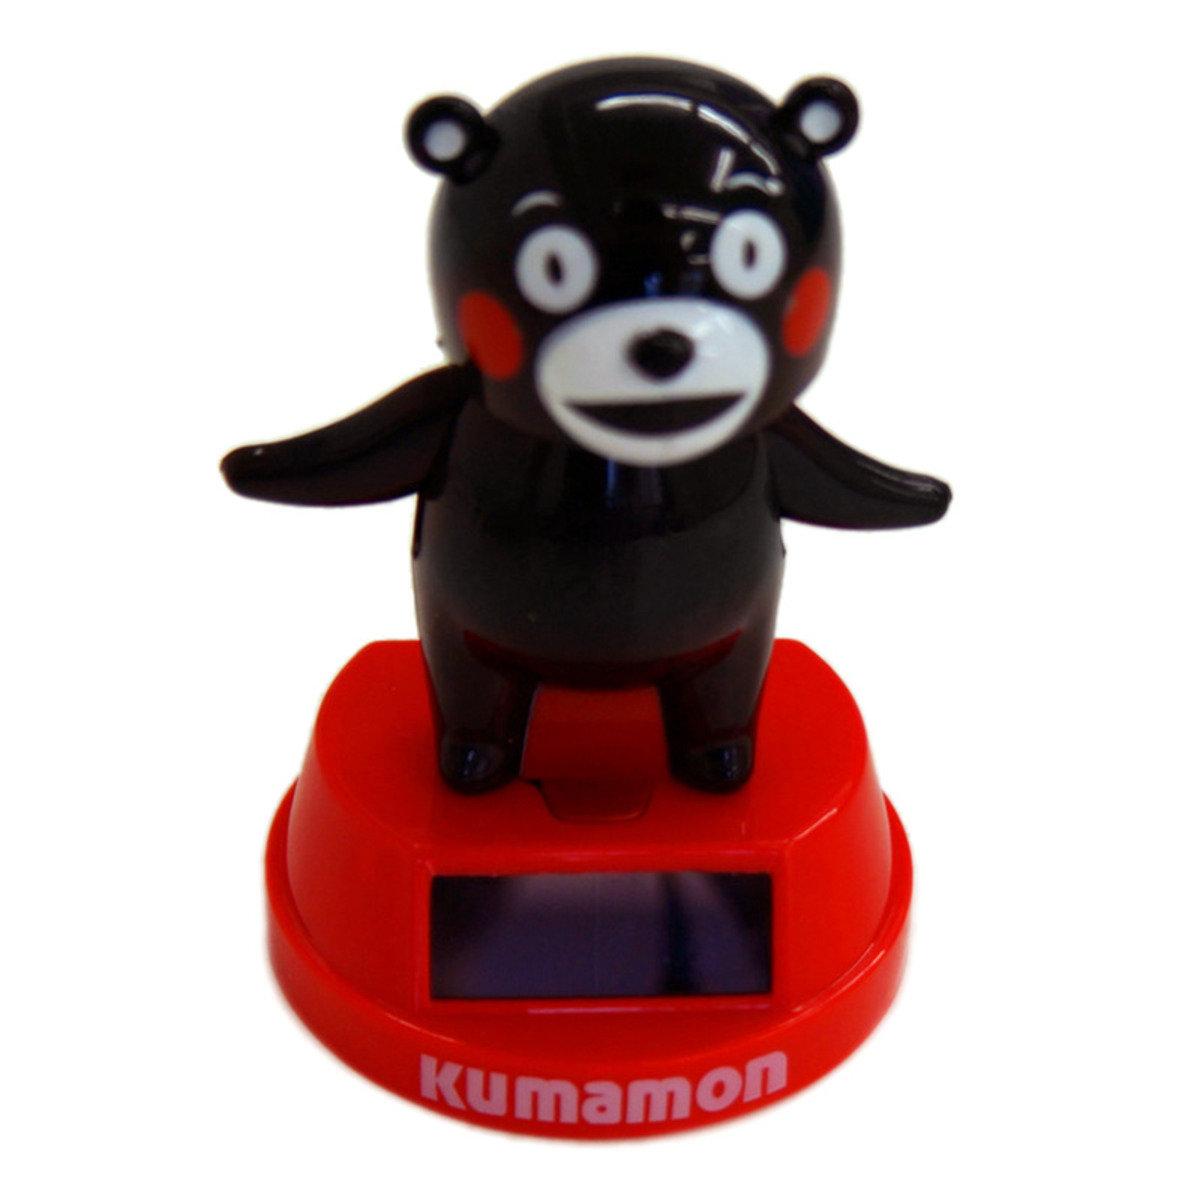 Kumamon太陽能公仔(搖頭+擺手)